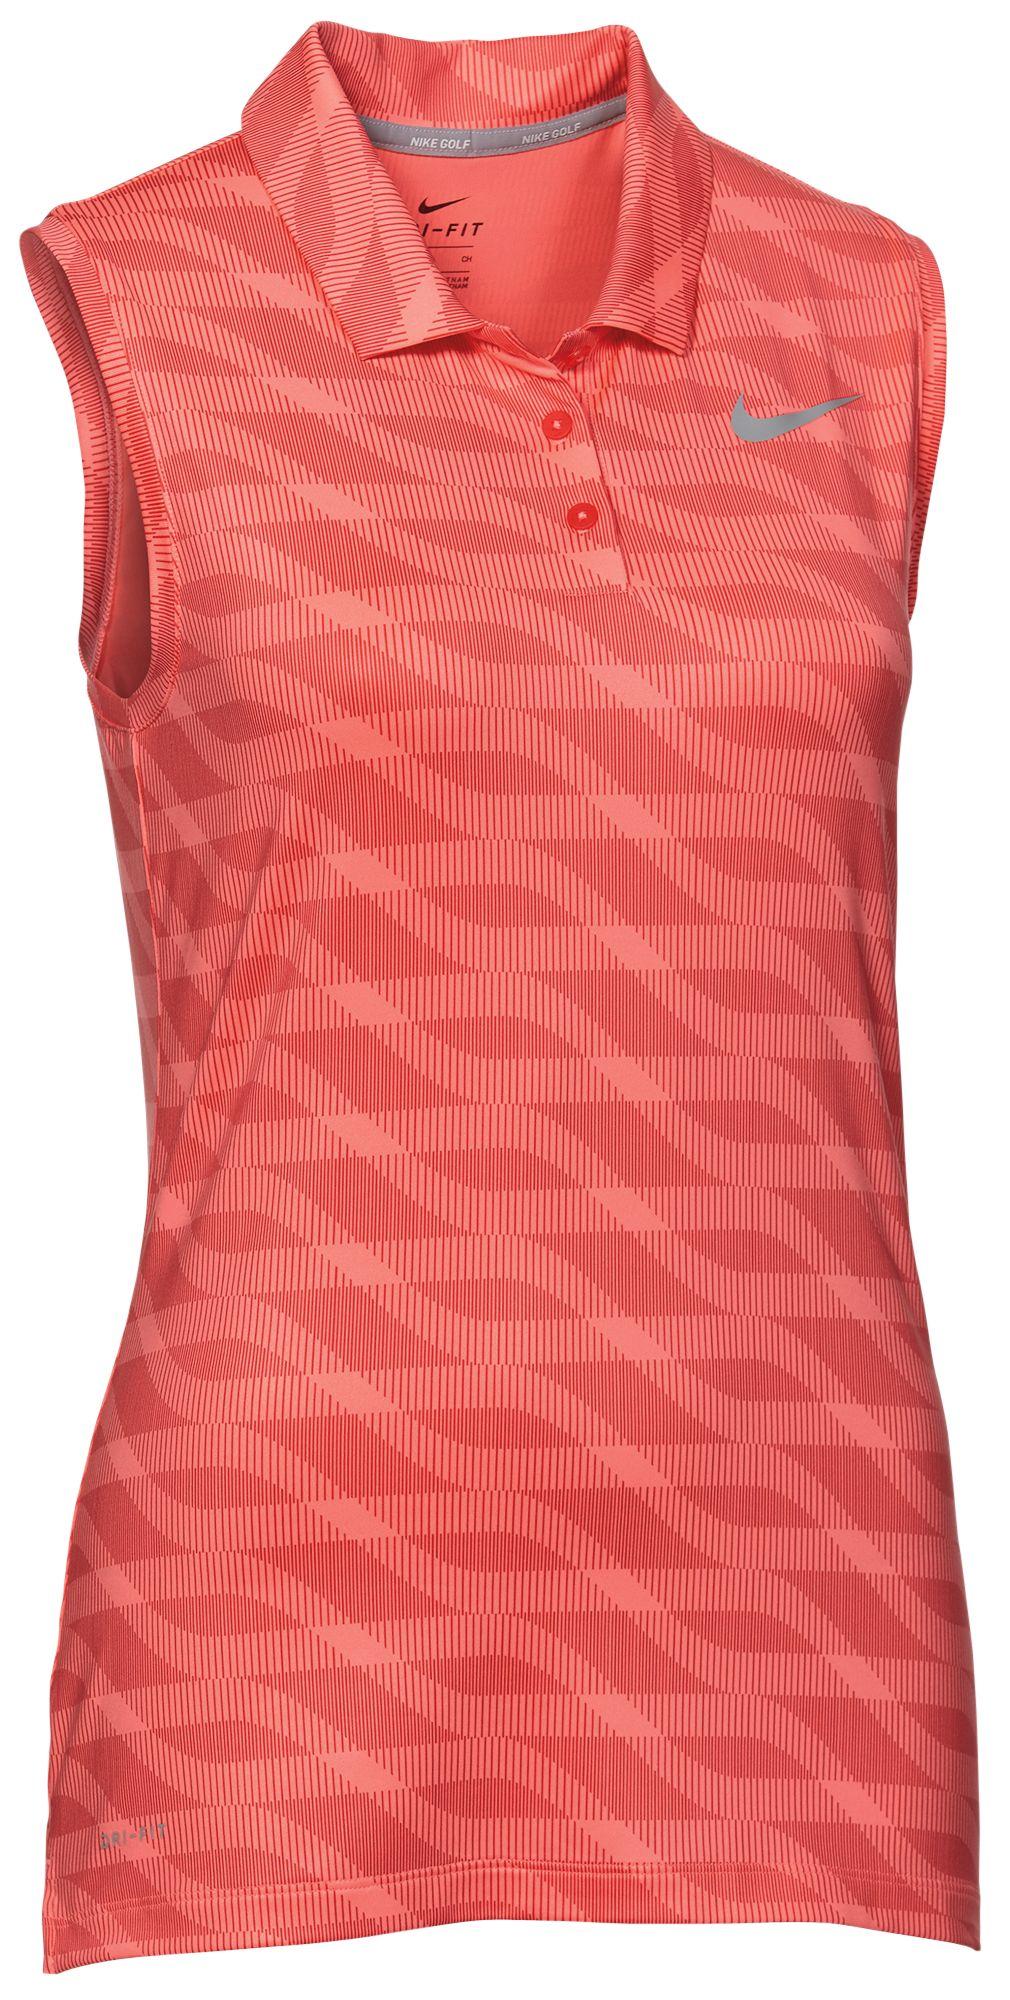 a50ff610311759 Womens Red Sleeveless Golf Shirts